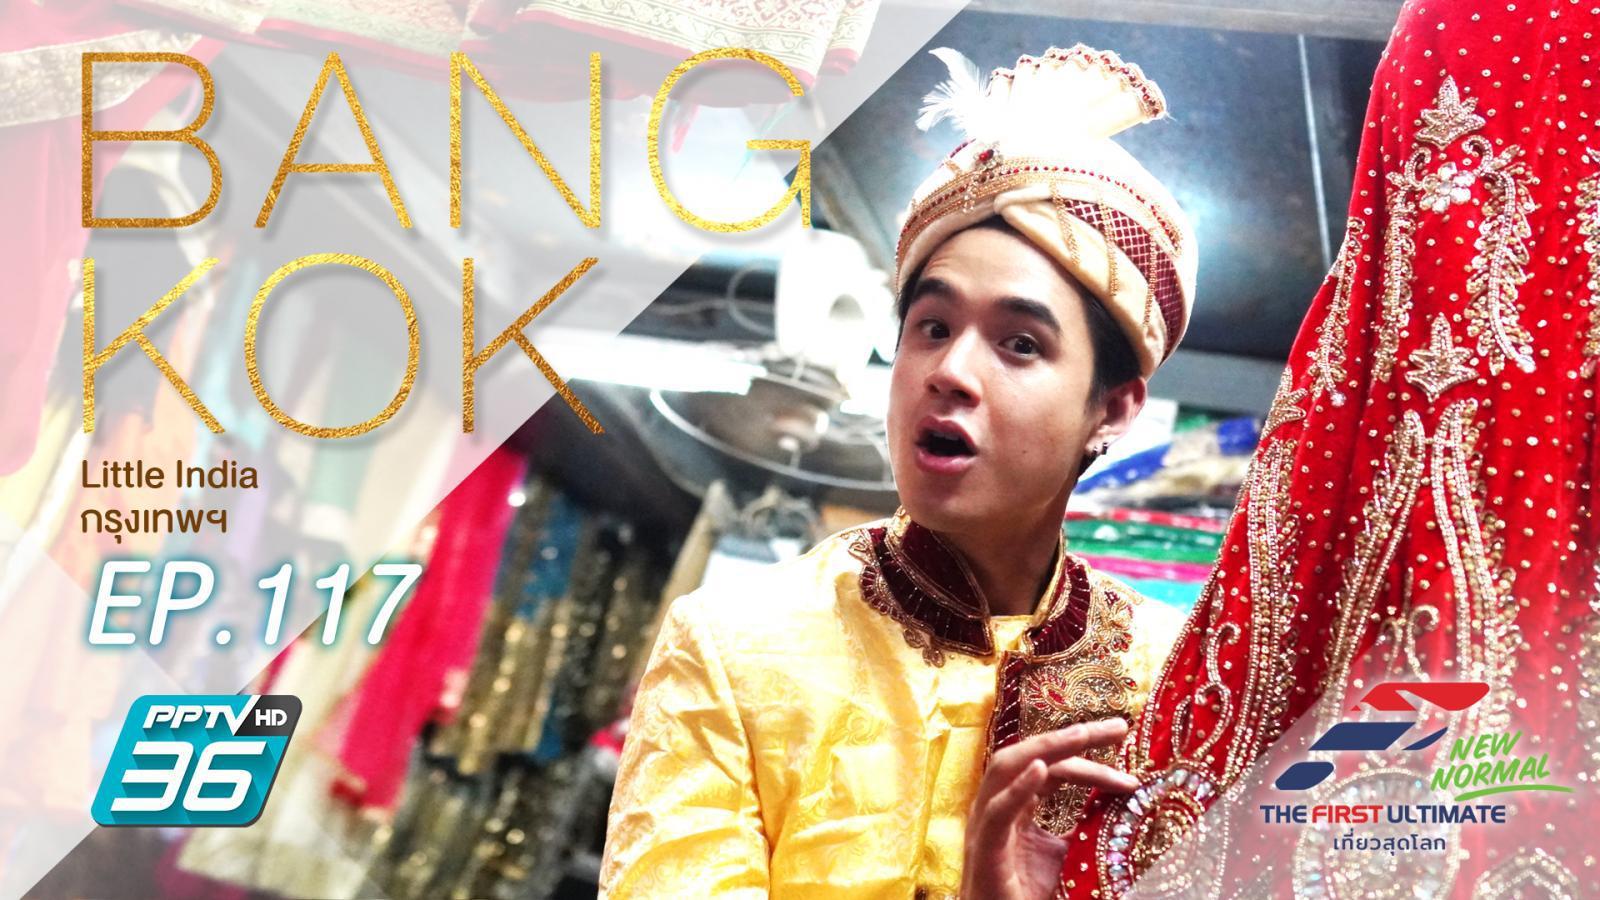 Bangkok - Little India